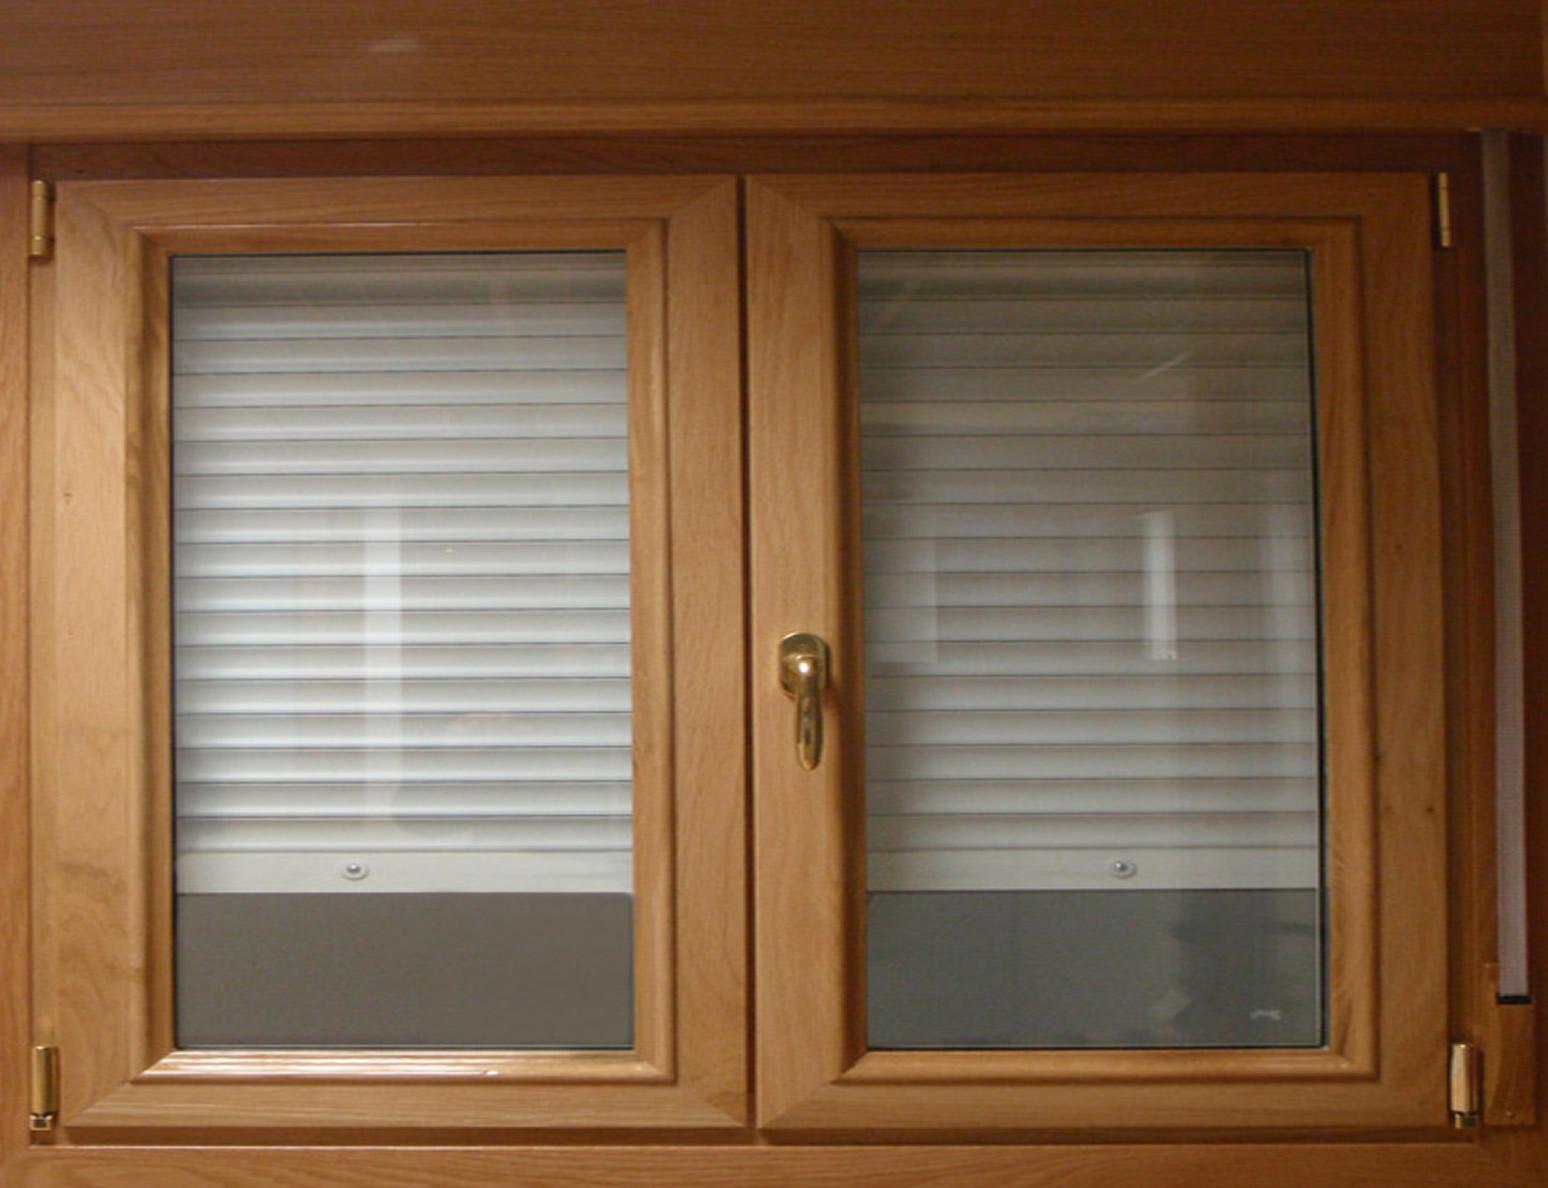 Busca ventanas de madera? - Carpinteros en Vitoria-Gasteiz ...